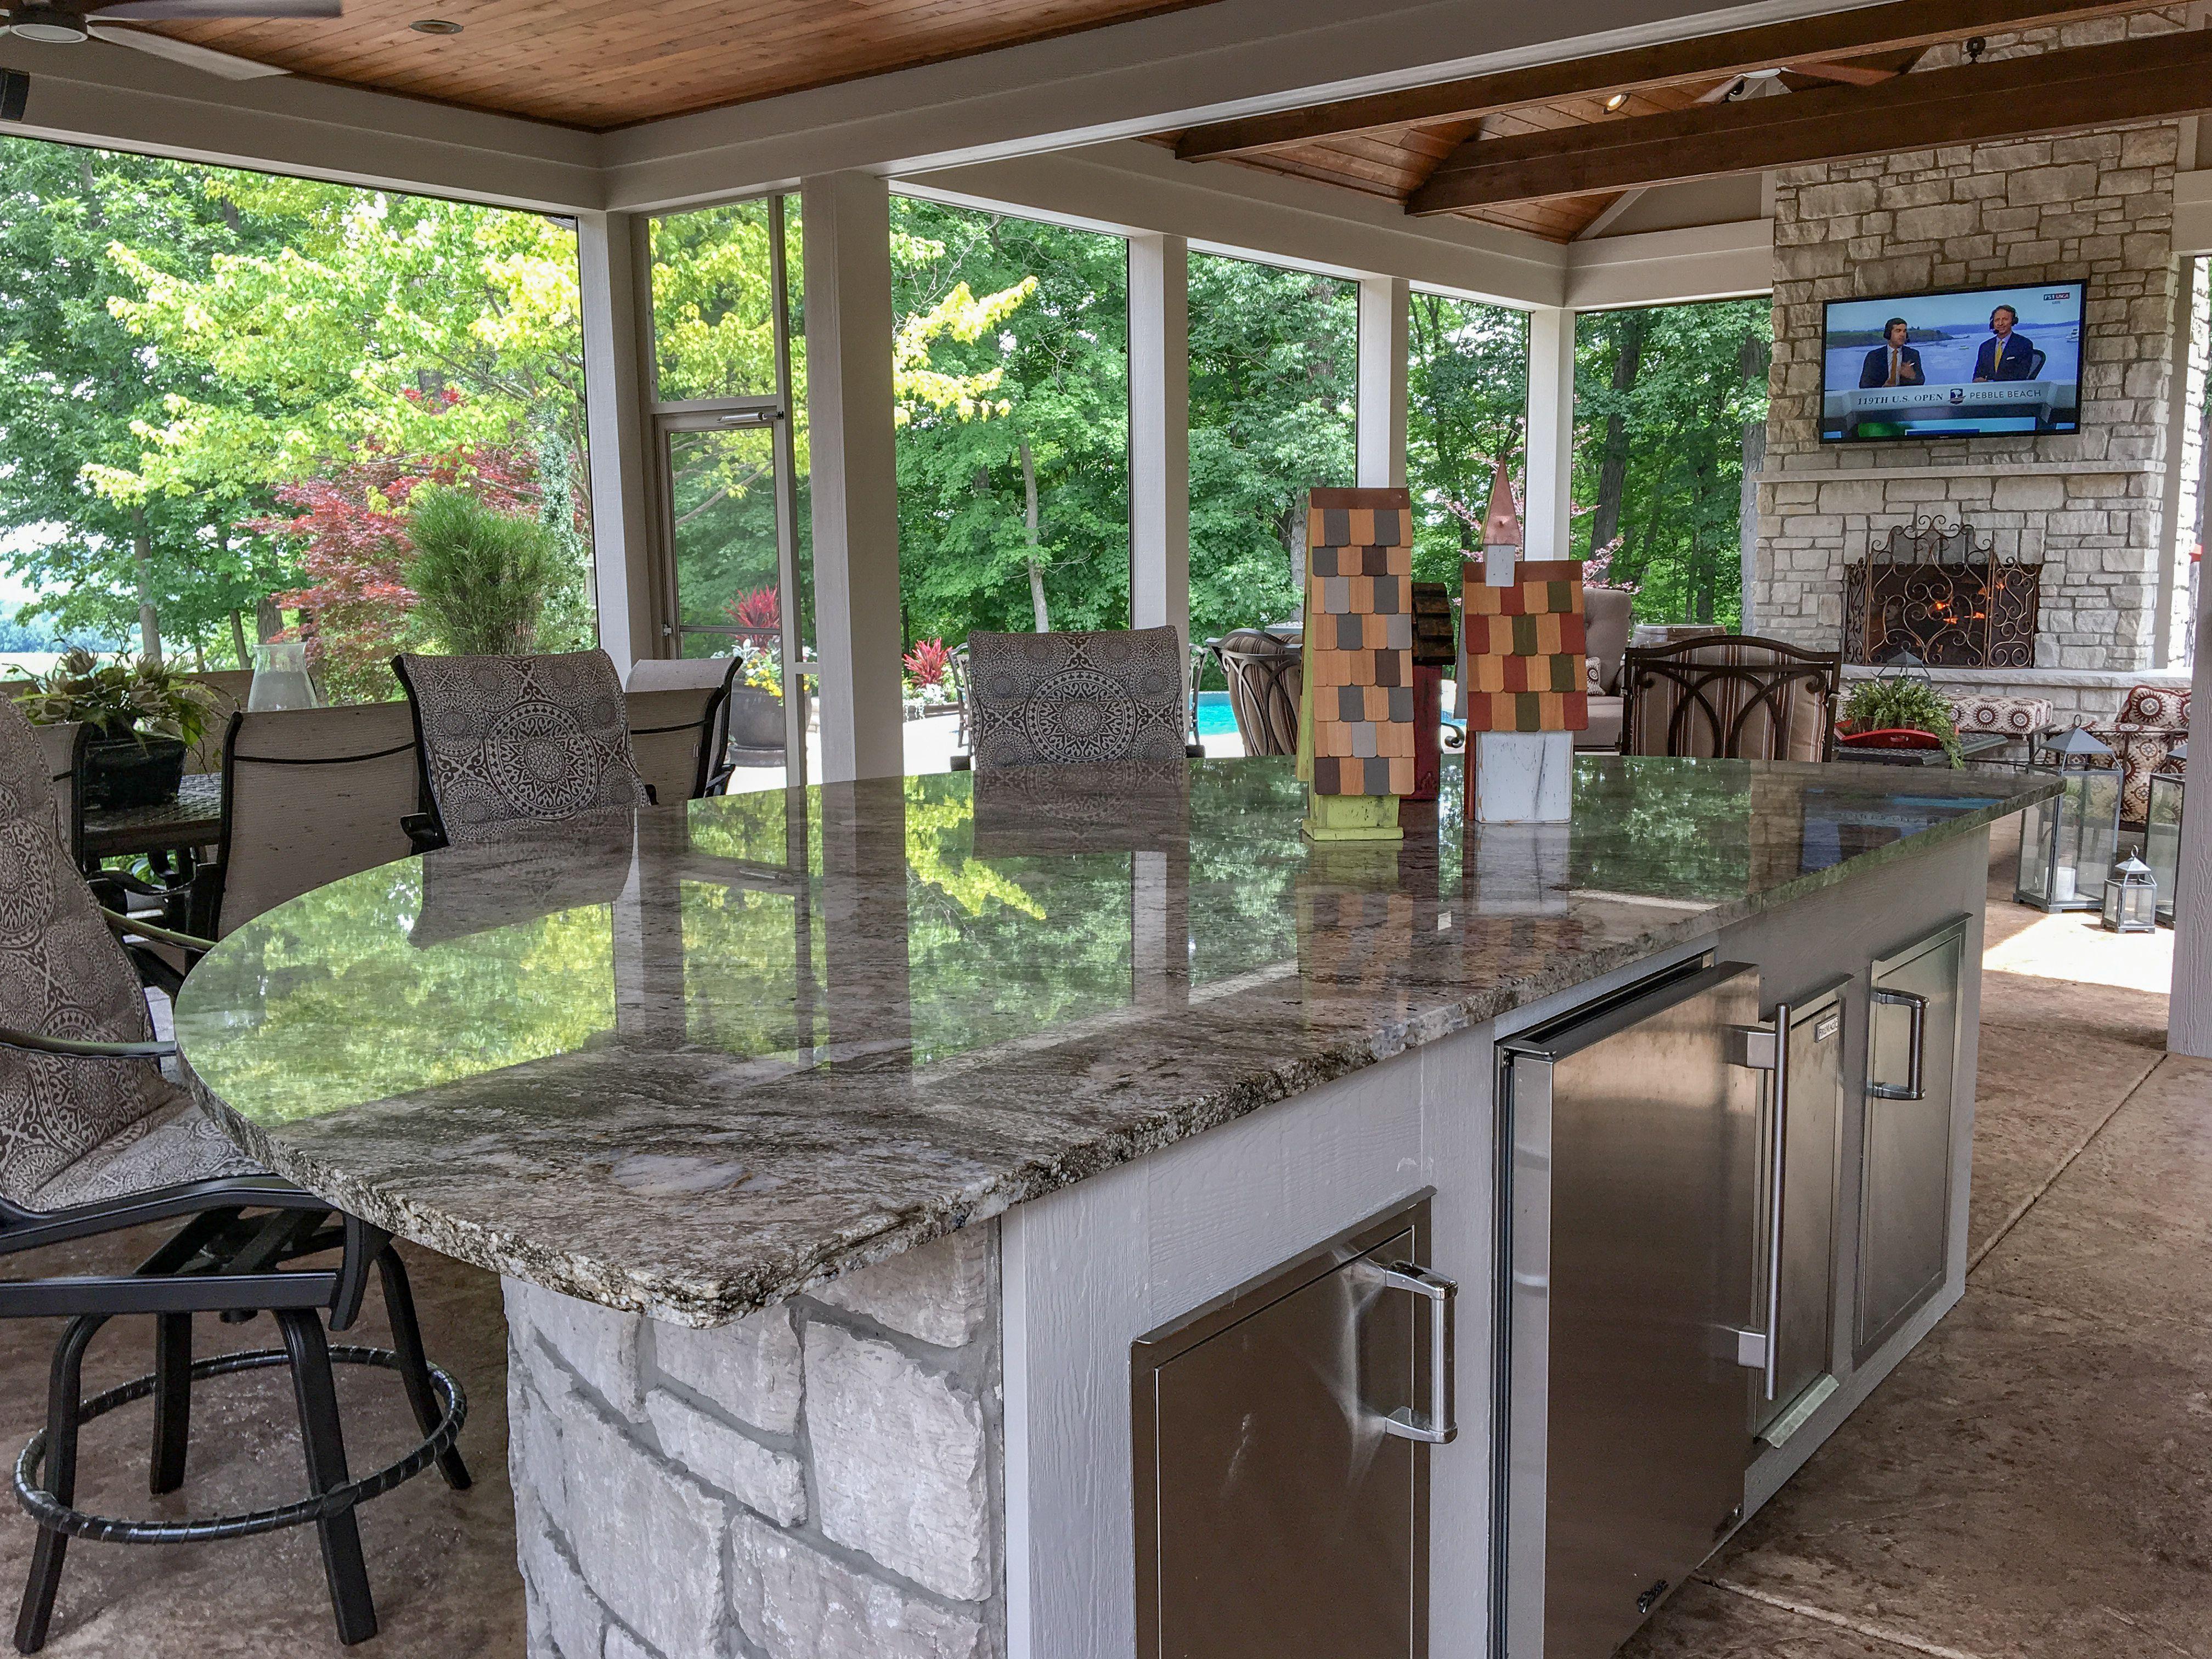 Custom outdoor kitchen island built in St. Louis, Missouri